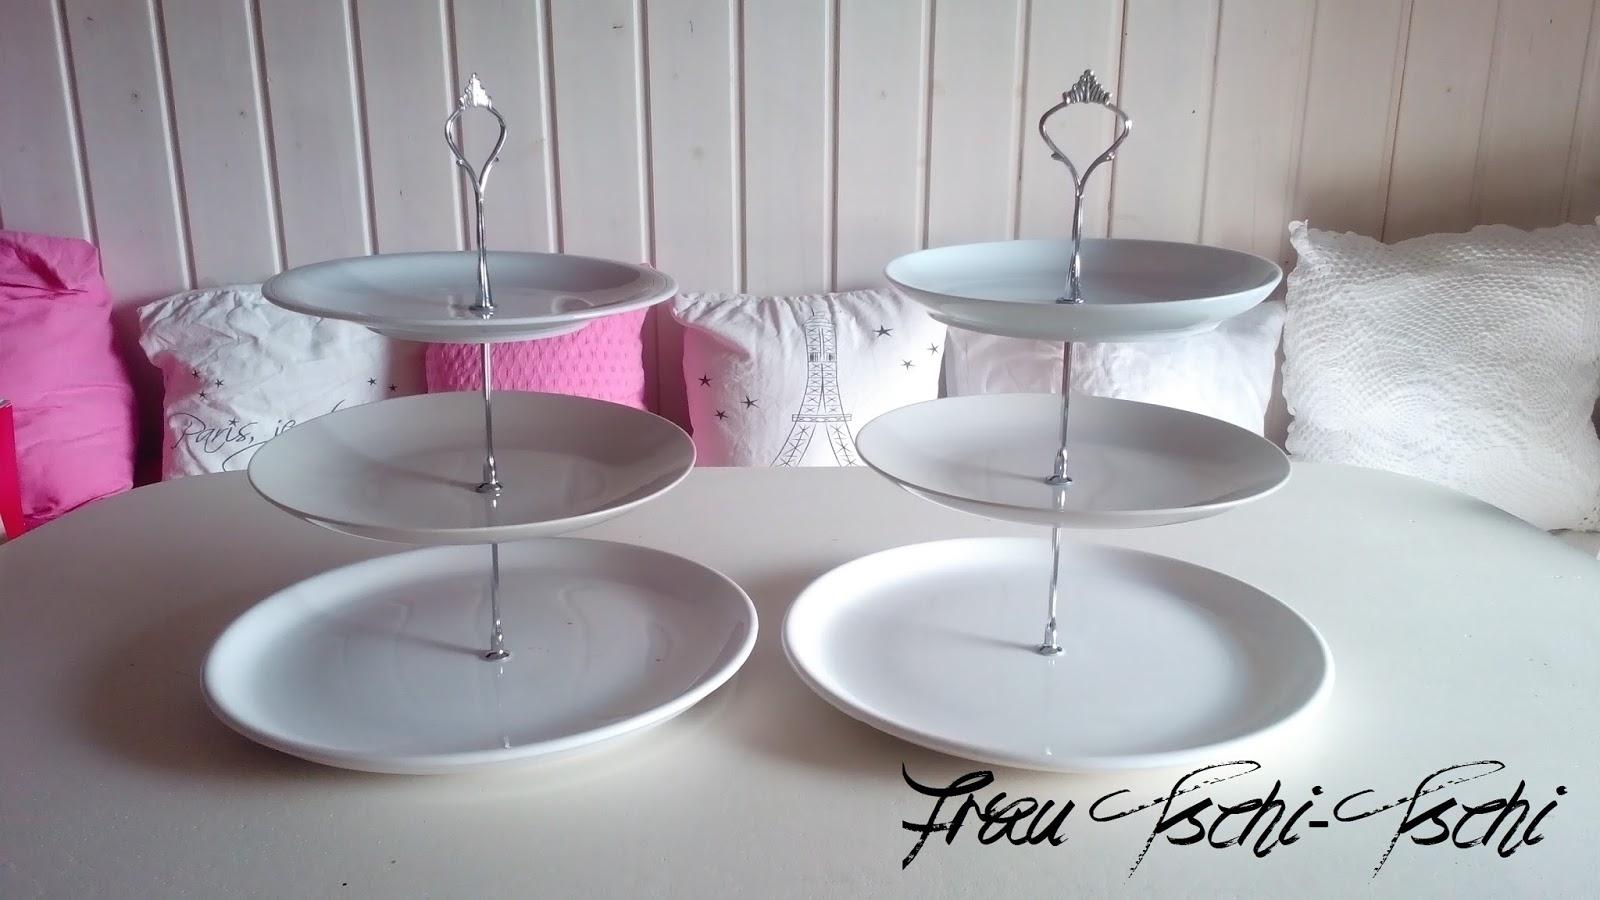 frau tschi tschi muffins muffins muffins. Black Bedroom Furniture Sets. Home Design Ideas